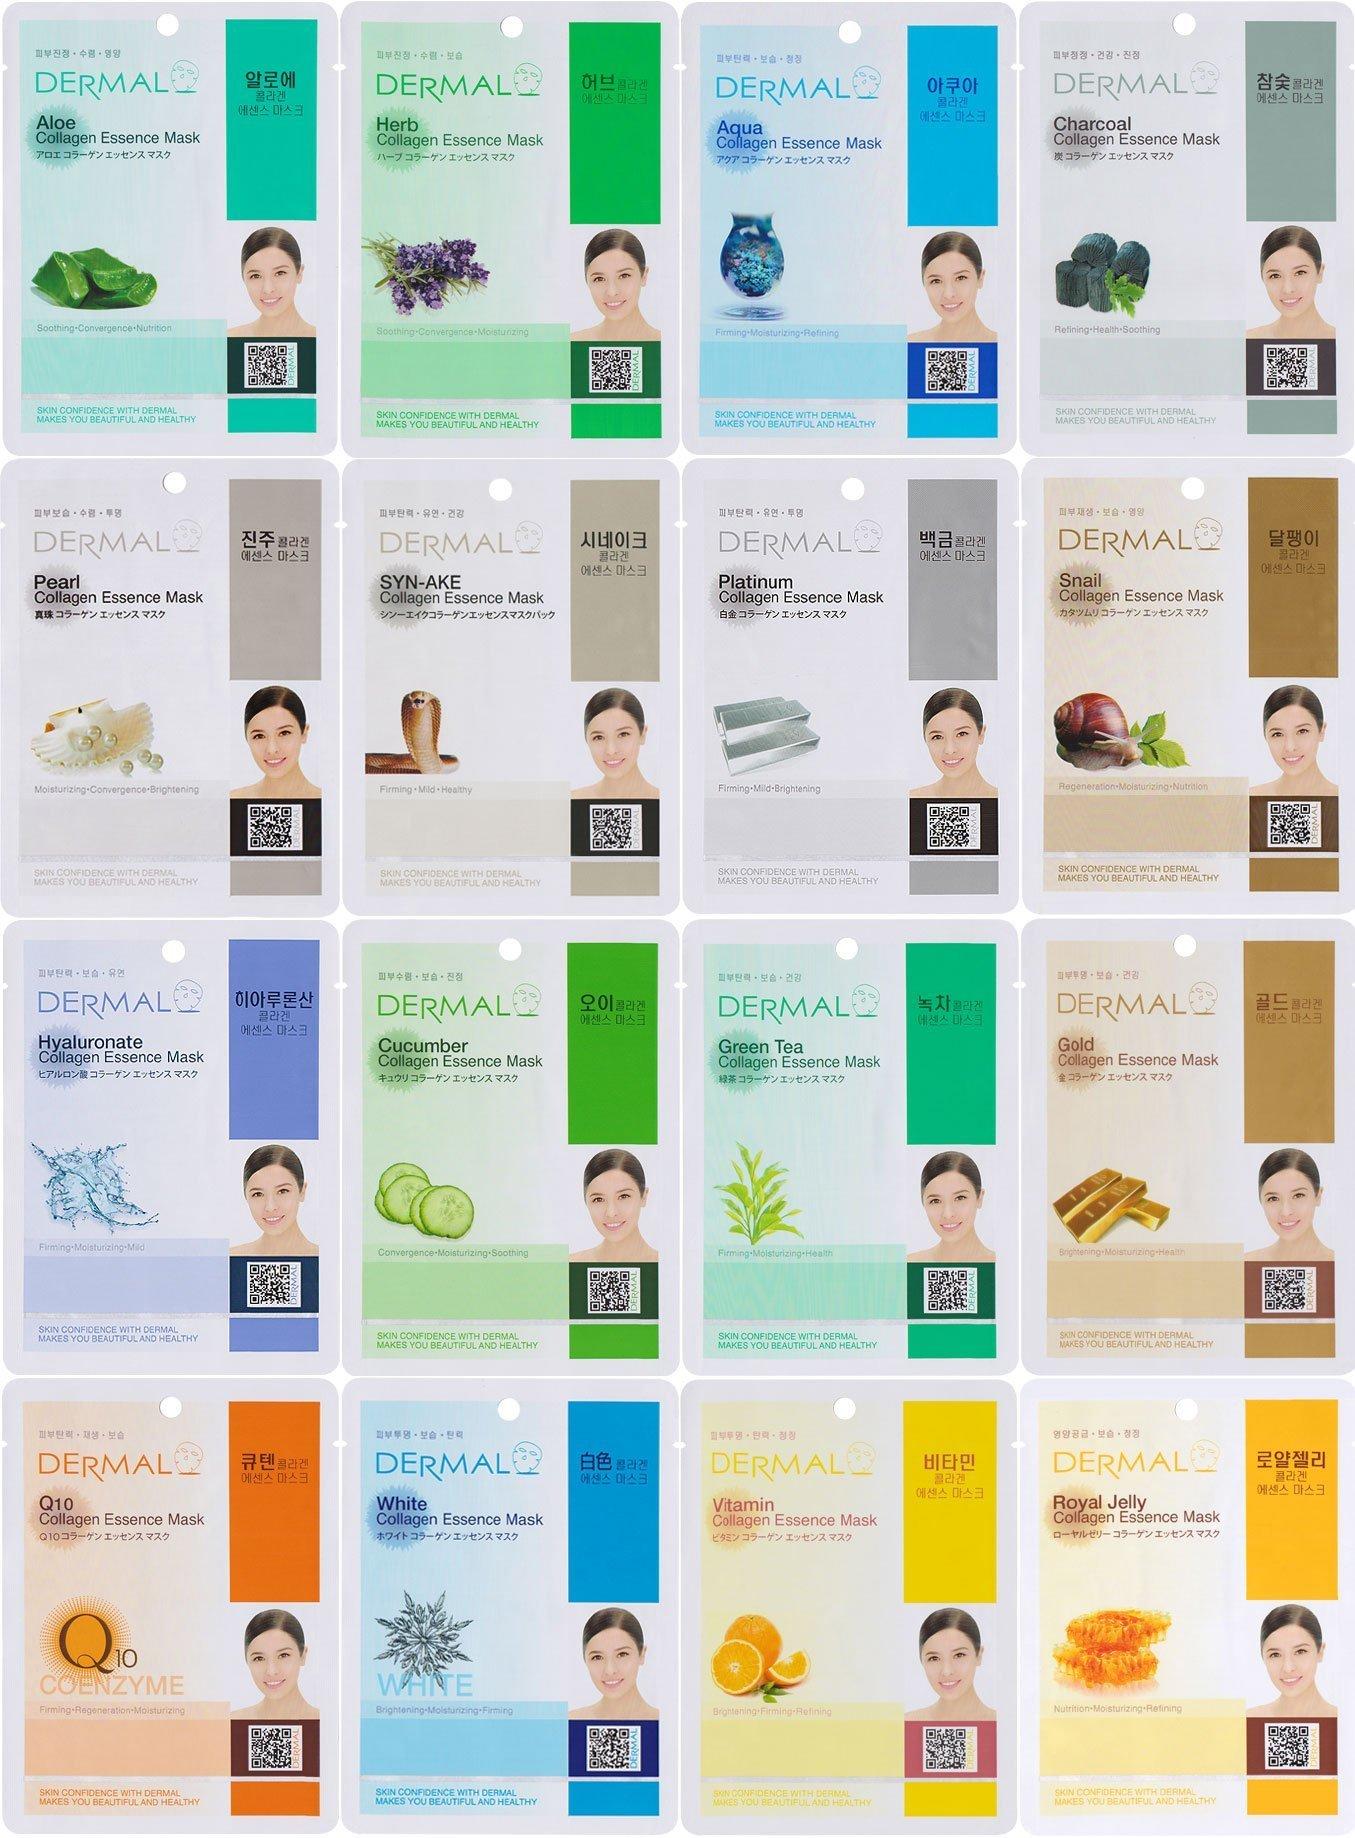 16-ct Dermal Korea Collagen Essence Face Masks $11 @ Amazon